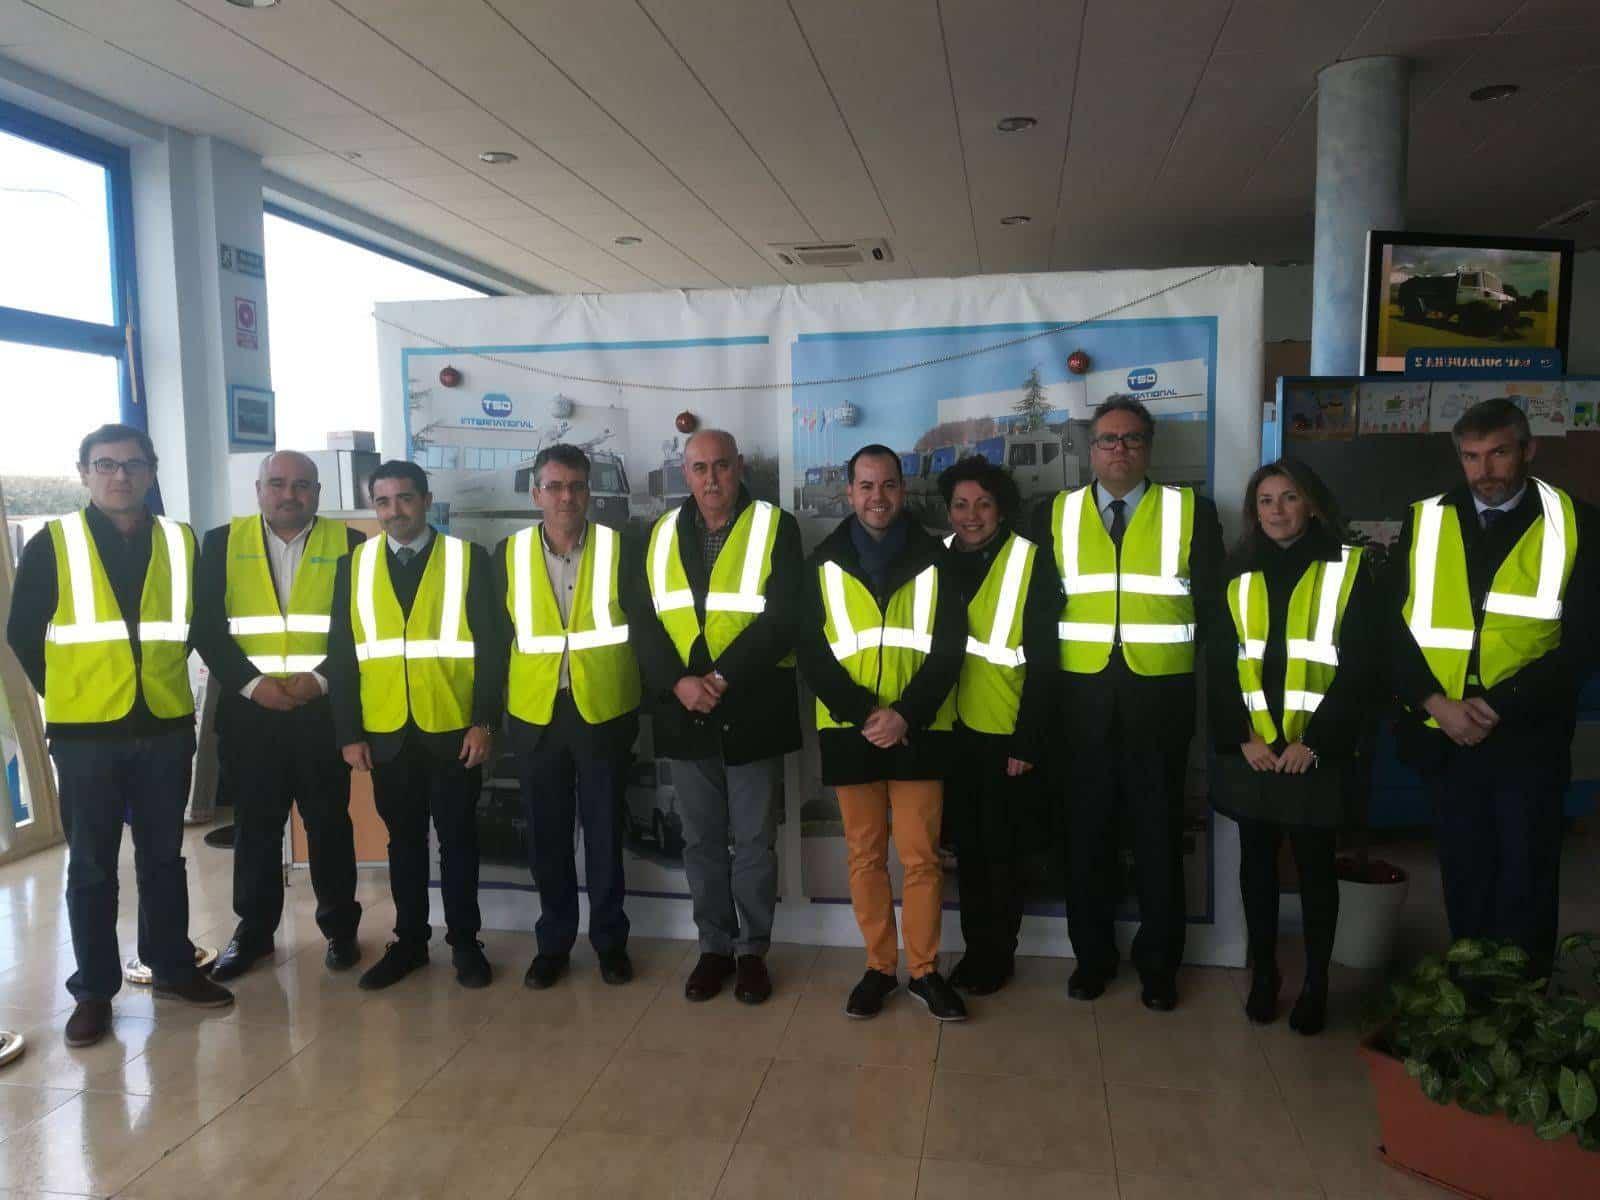 tsi divisegur proyecto CREA - Director General de Empleo visitó TSD-DIVISEGUR en Herencia